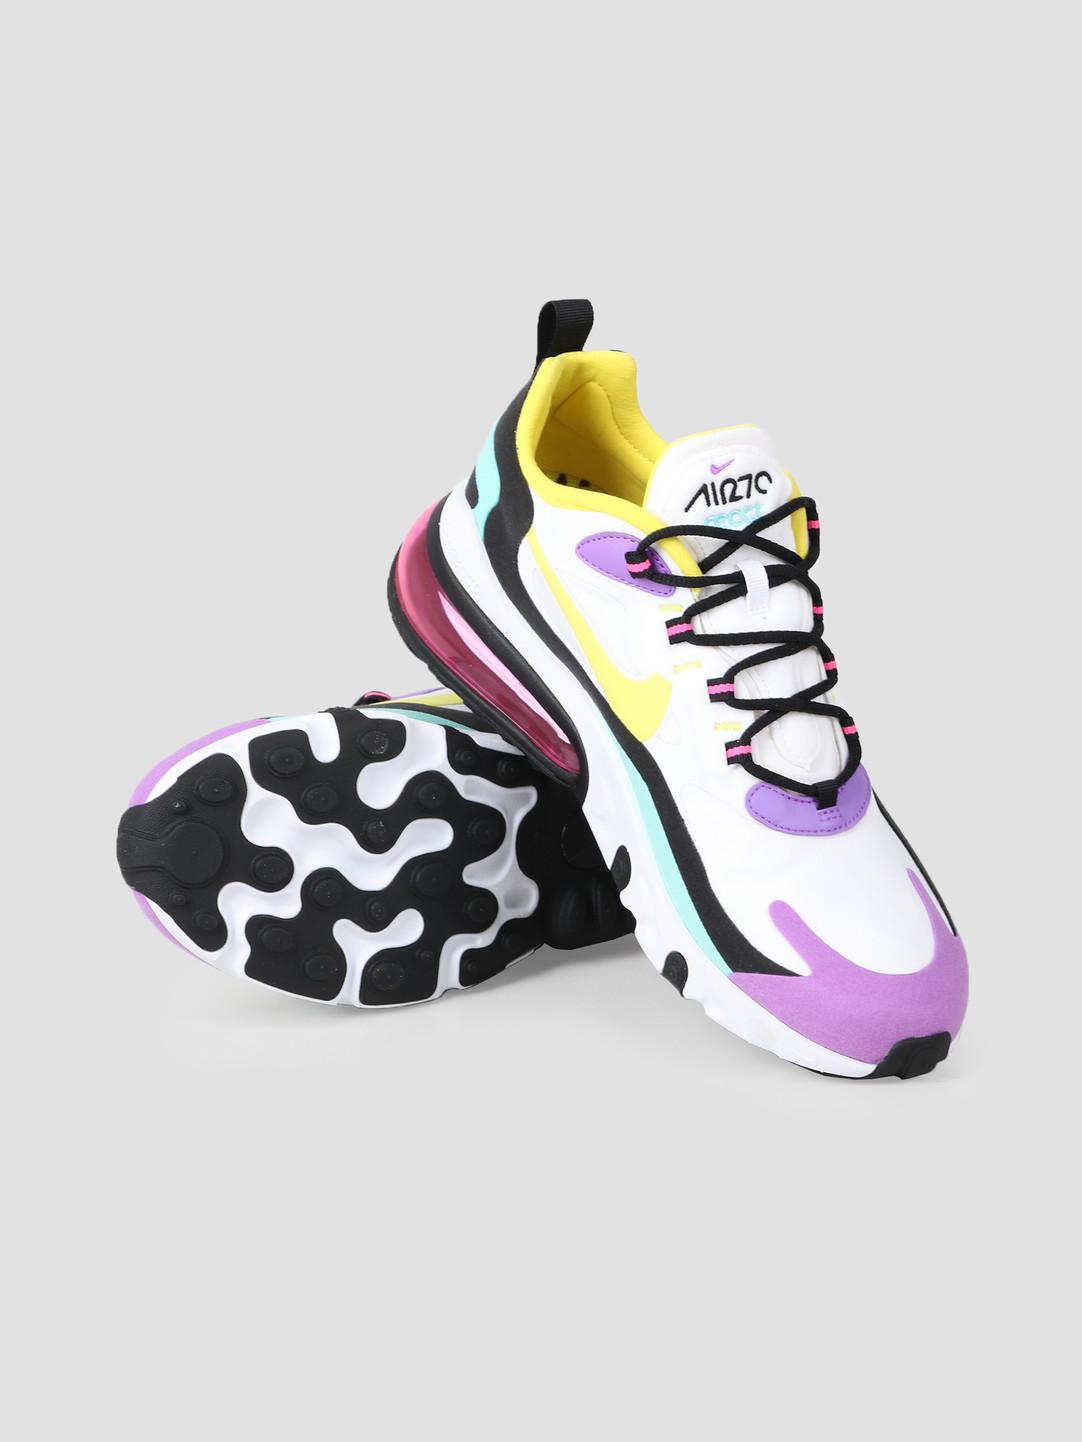 Nike Nike Air Max 270 React White Dynamic Yellow Black Bright Violet AO4971-101